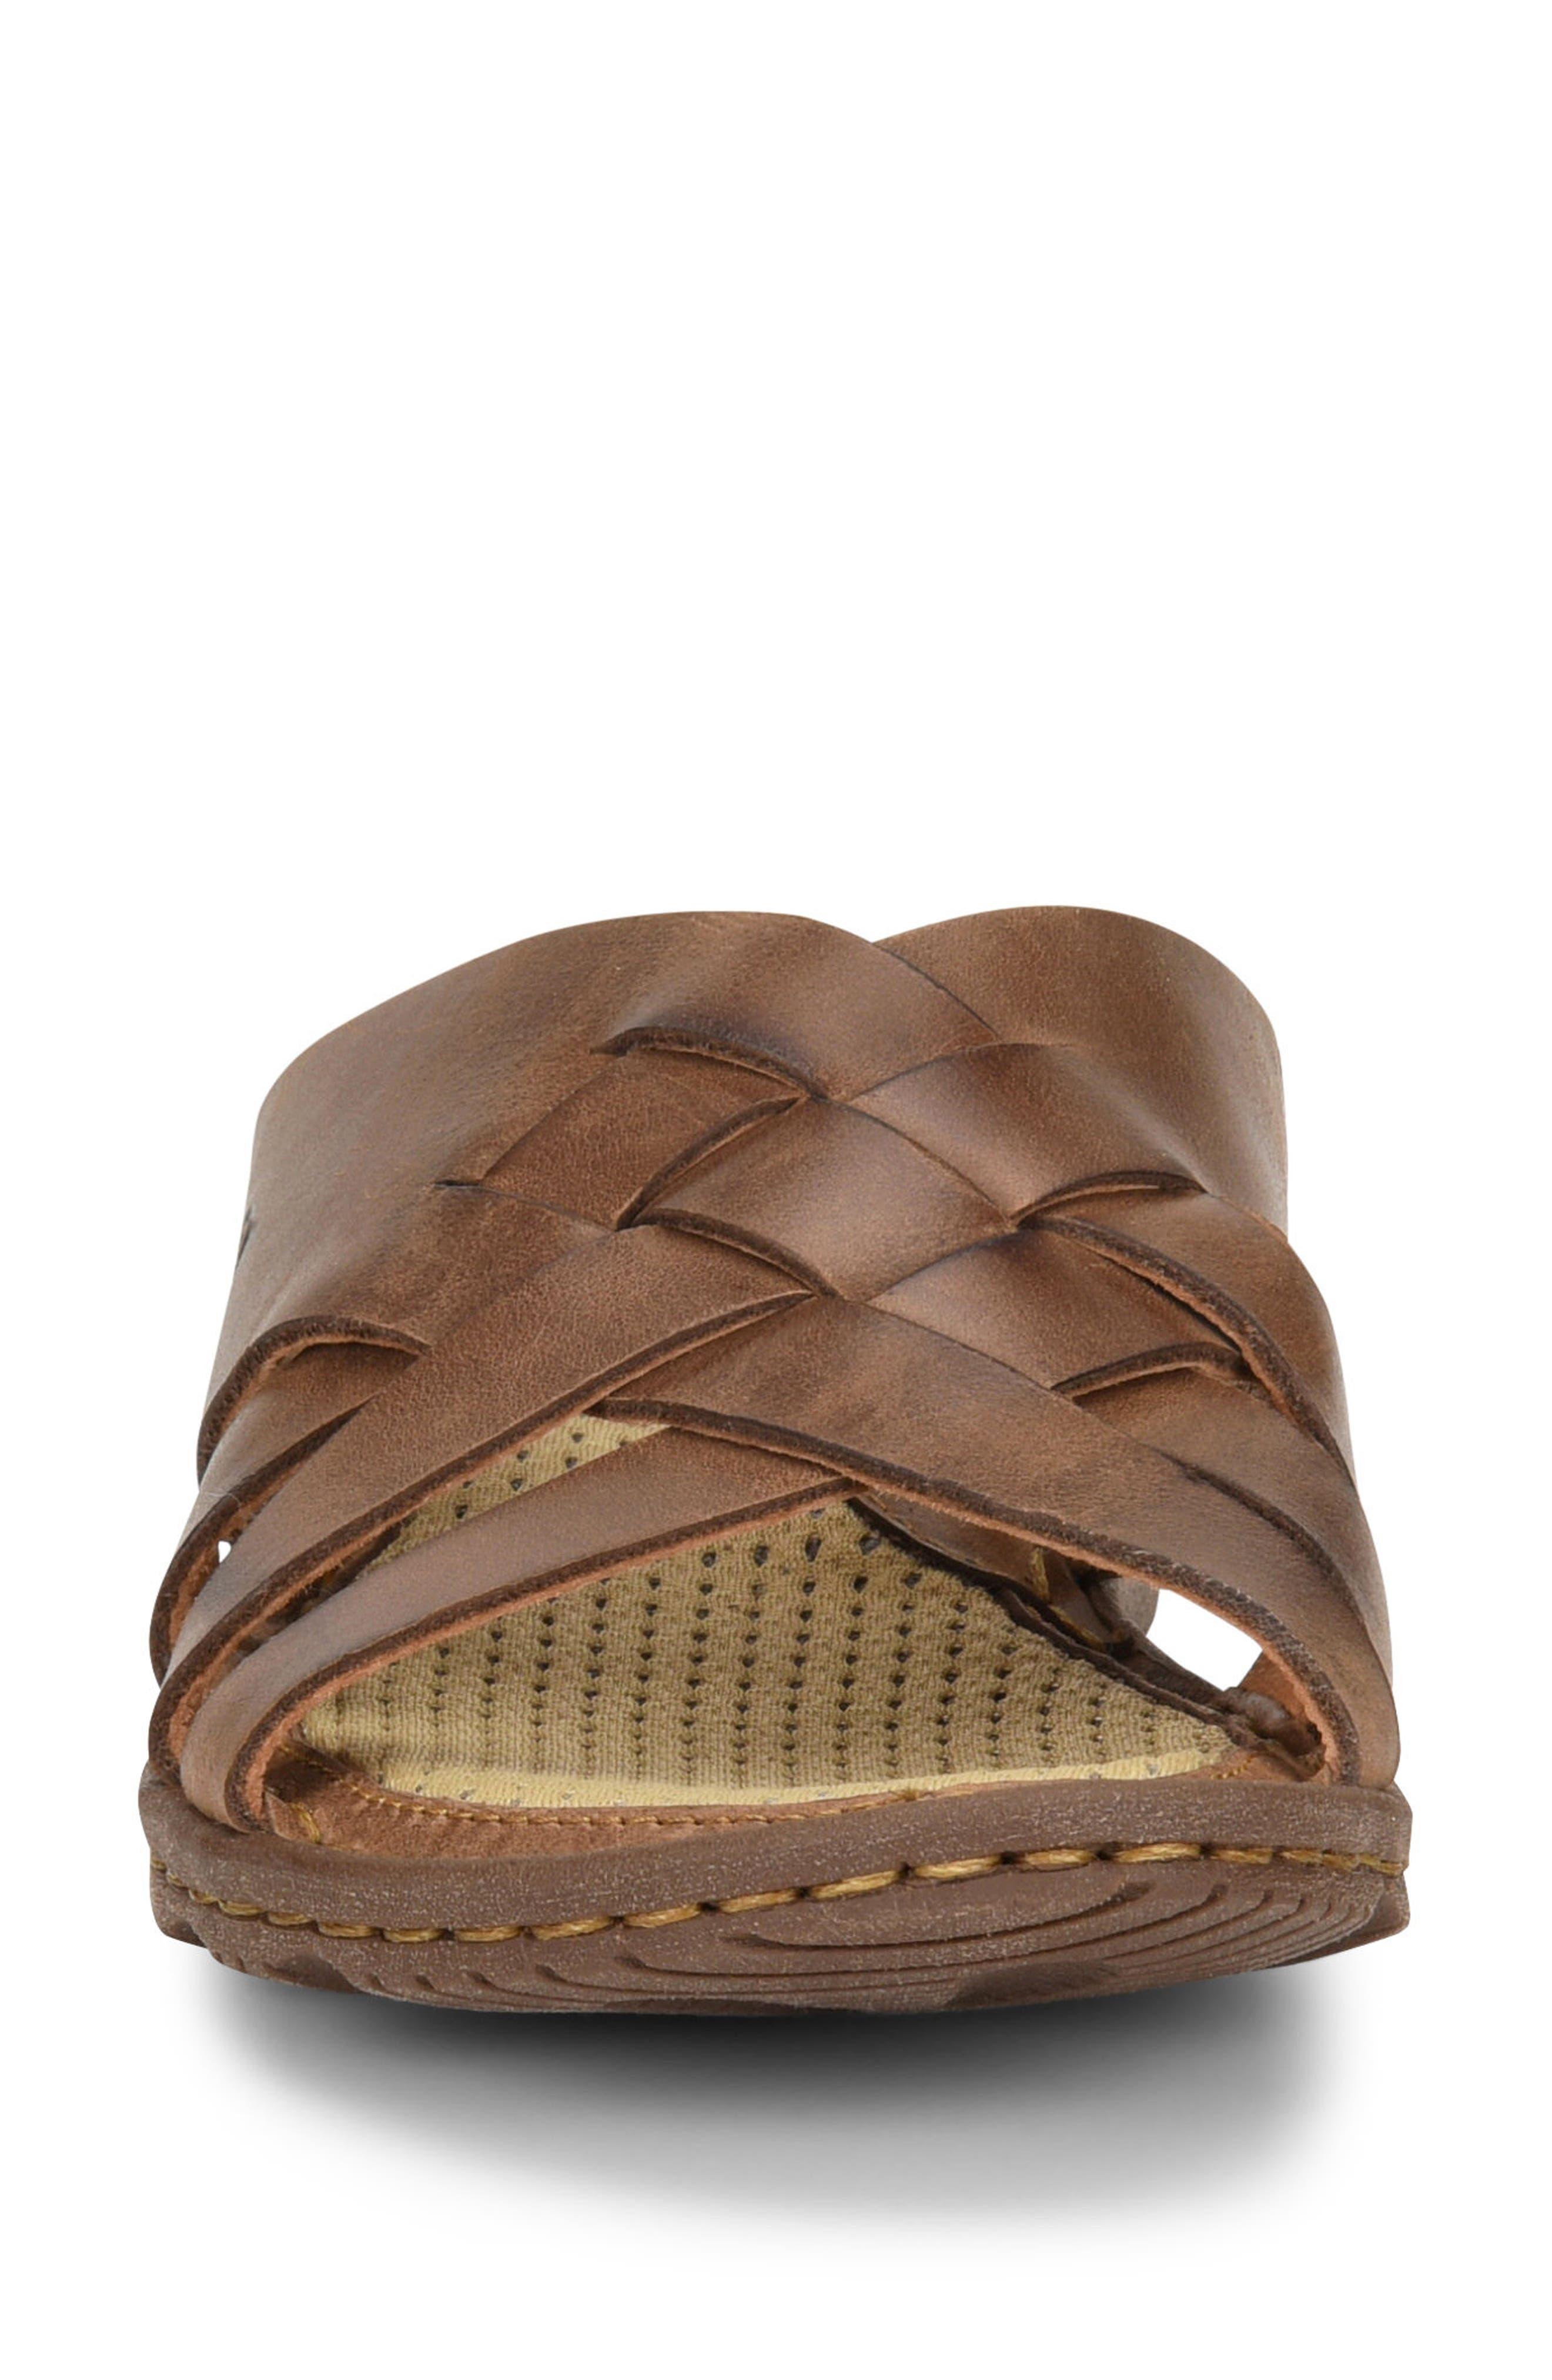 Tarpon Slide Sandal,                             Alternate thumbnail 15, color,